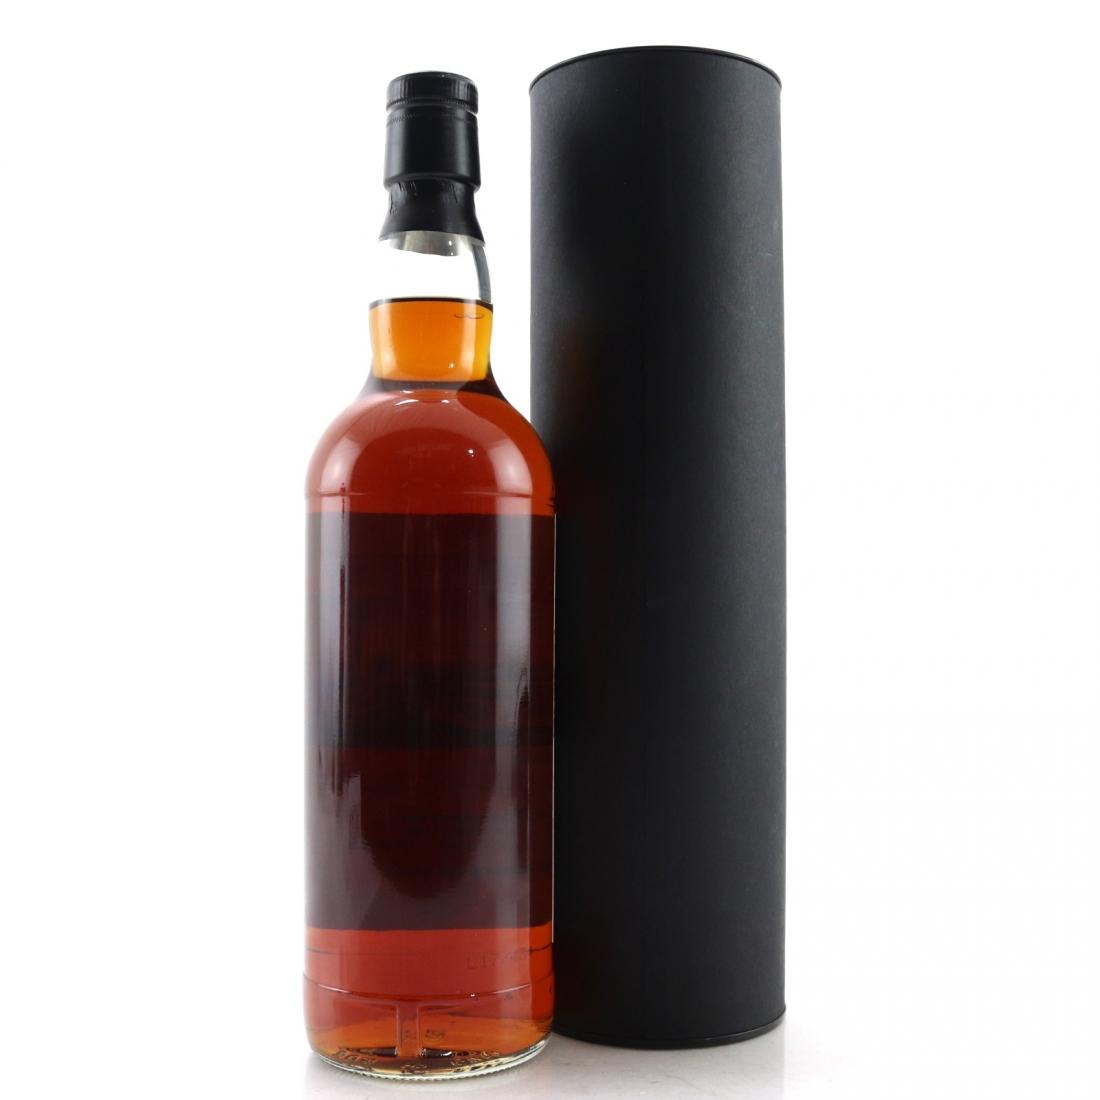 Clynelish 1996 Kirsch Whisky / 2017 Whiskyherbst Berlin Edition